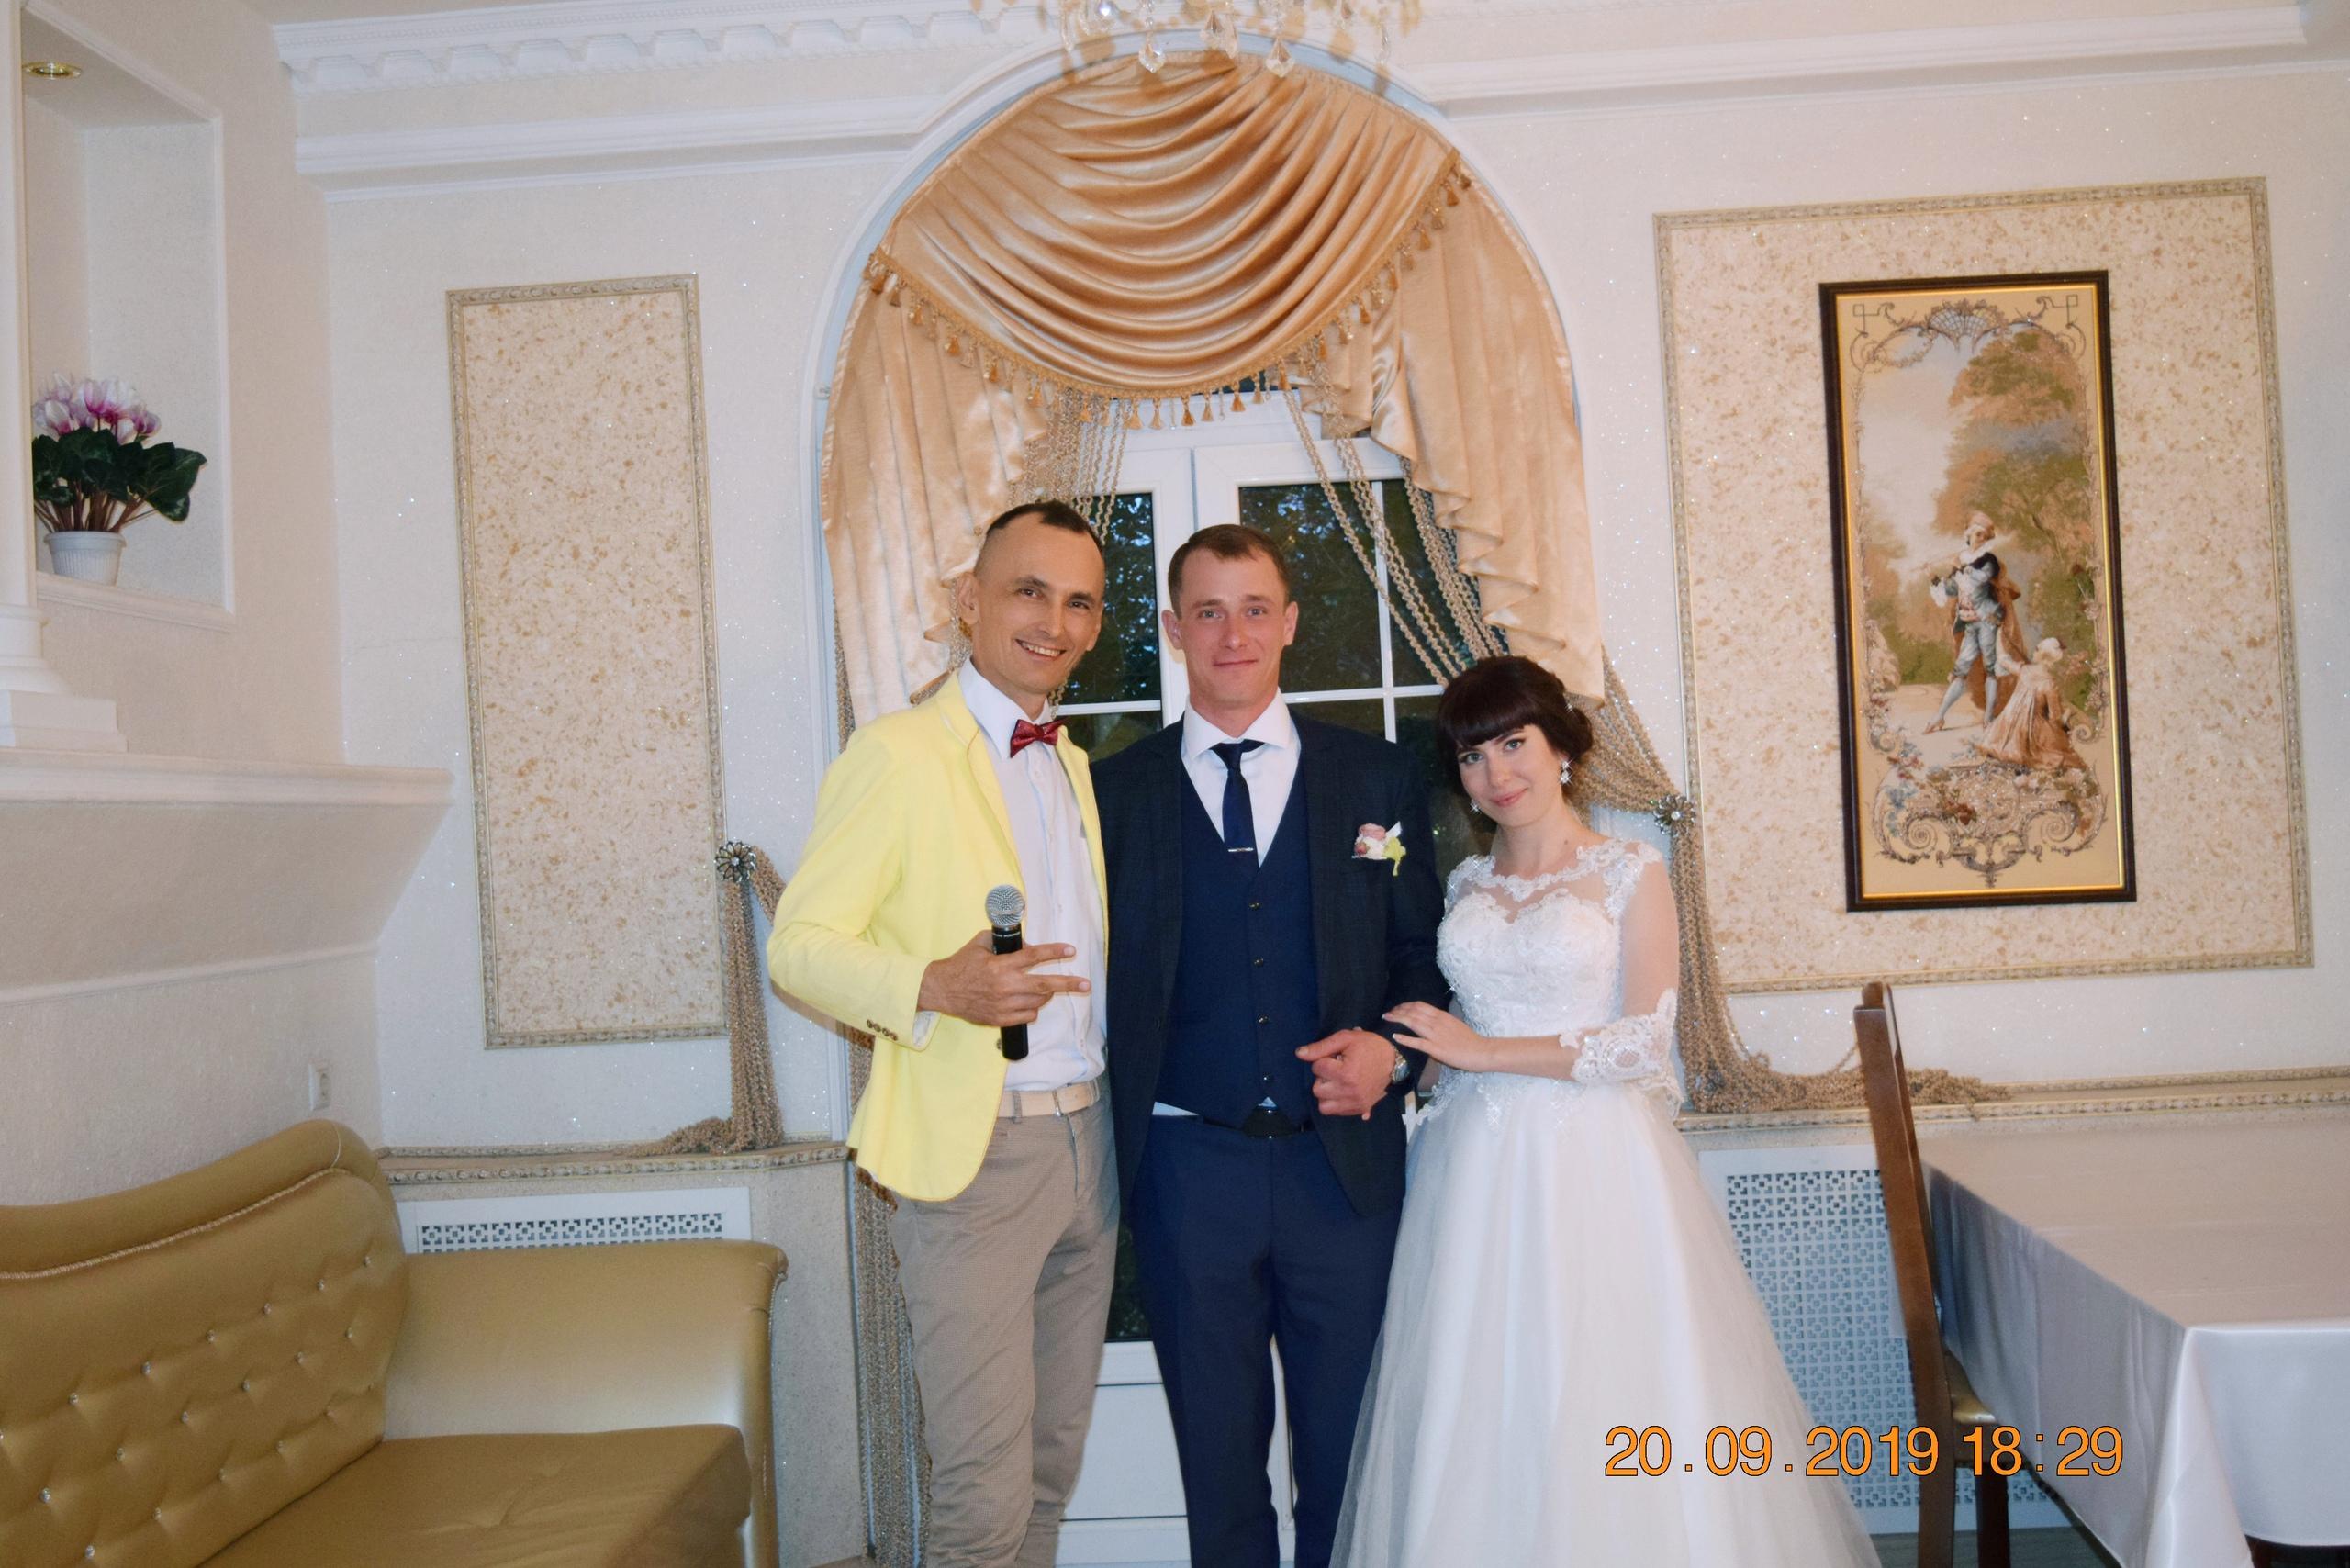 ZWO9xEDESOQ - Свадьба Сергея и Оксаны